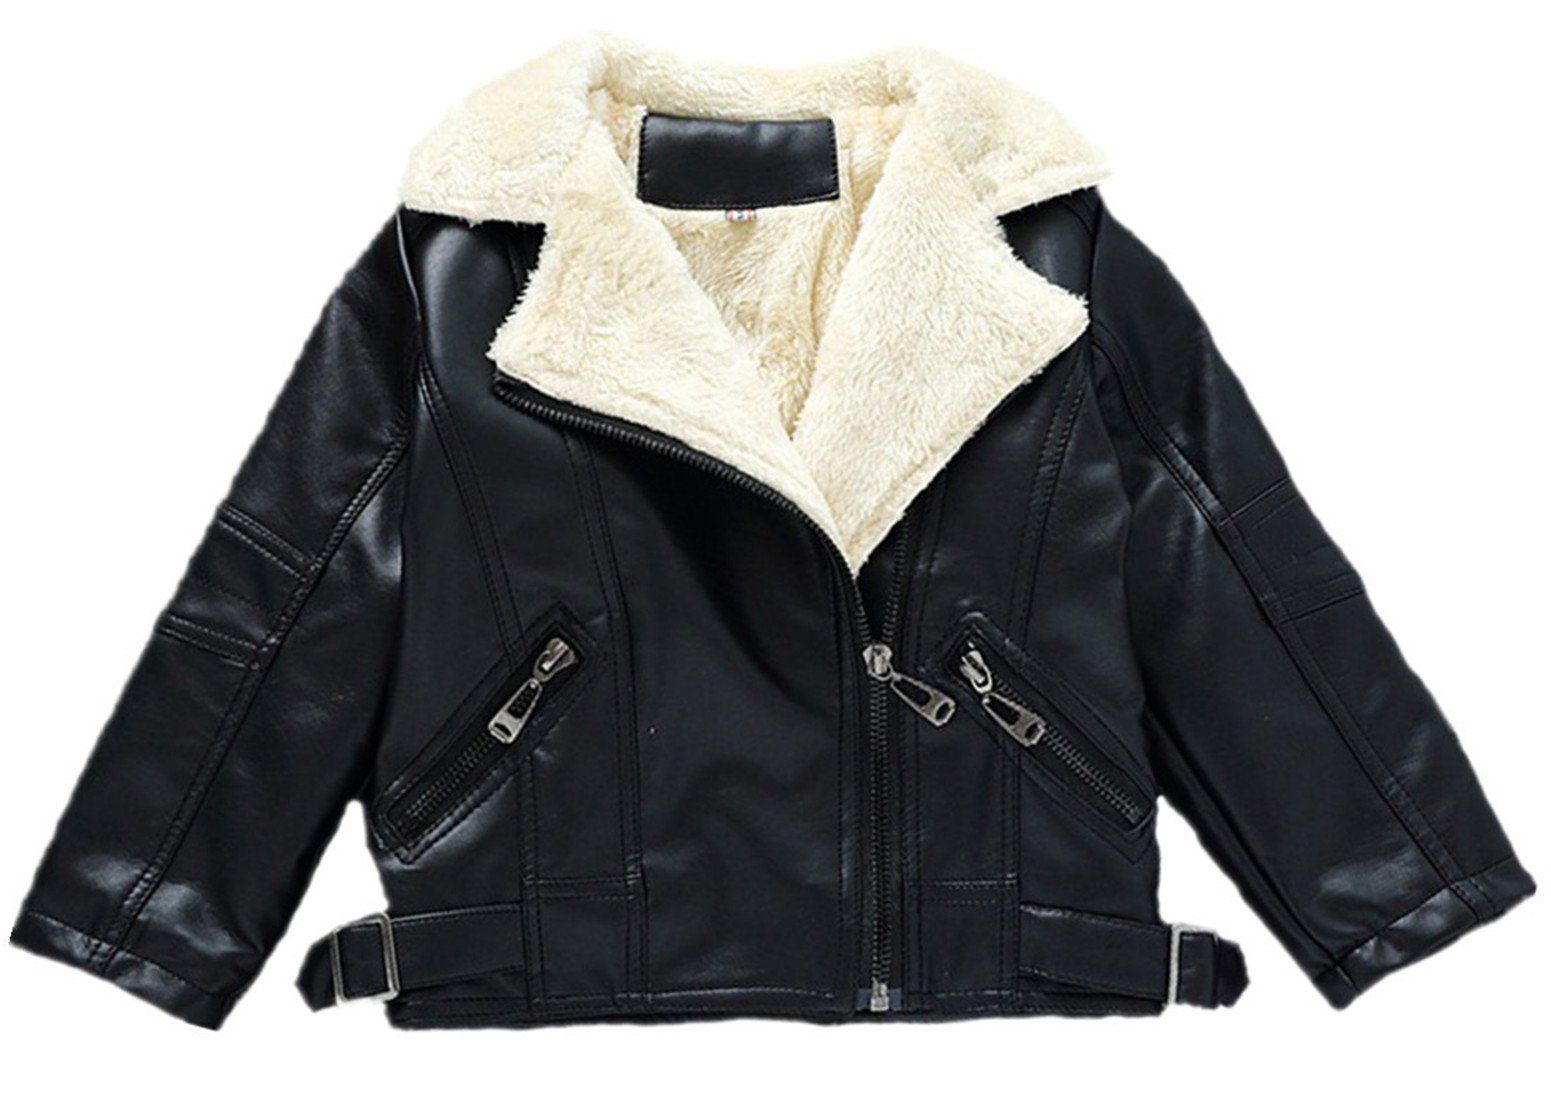 Vska Kids Baby Boy Fashion Children Collar Motorcycle Faux Leather Coats Jacket 3t Black High Quality Materia Leather Coat Jacket Boy Fashion Baby Boy Fashion [ 1100 x 1551 Pixel ]